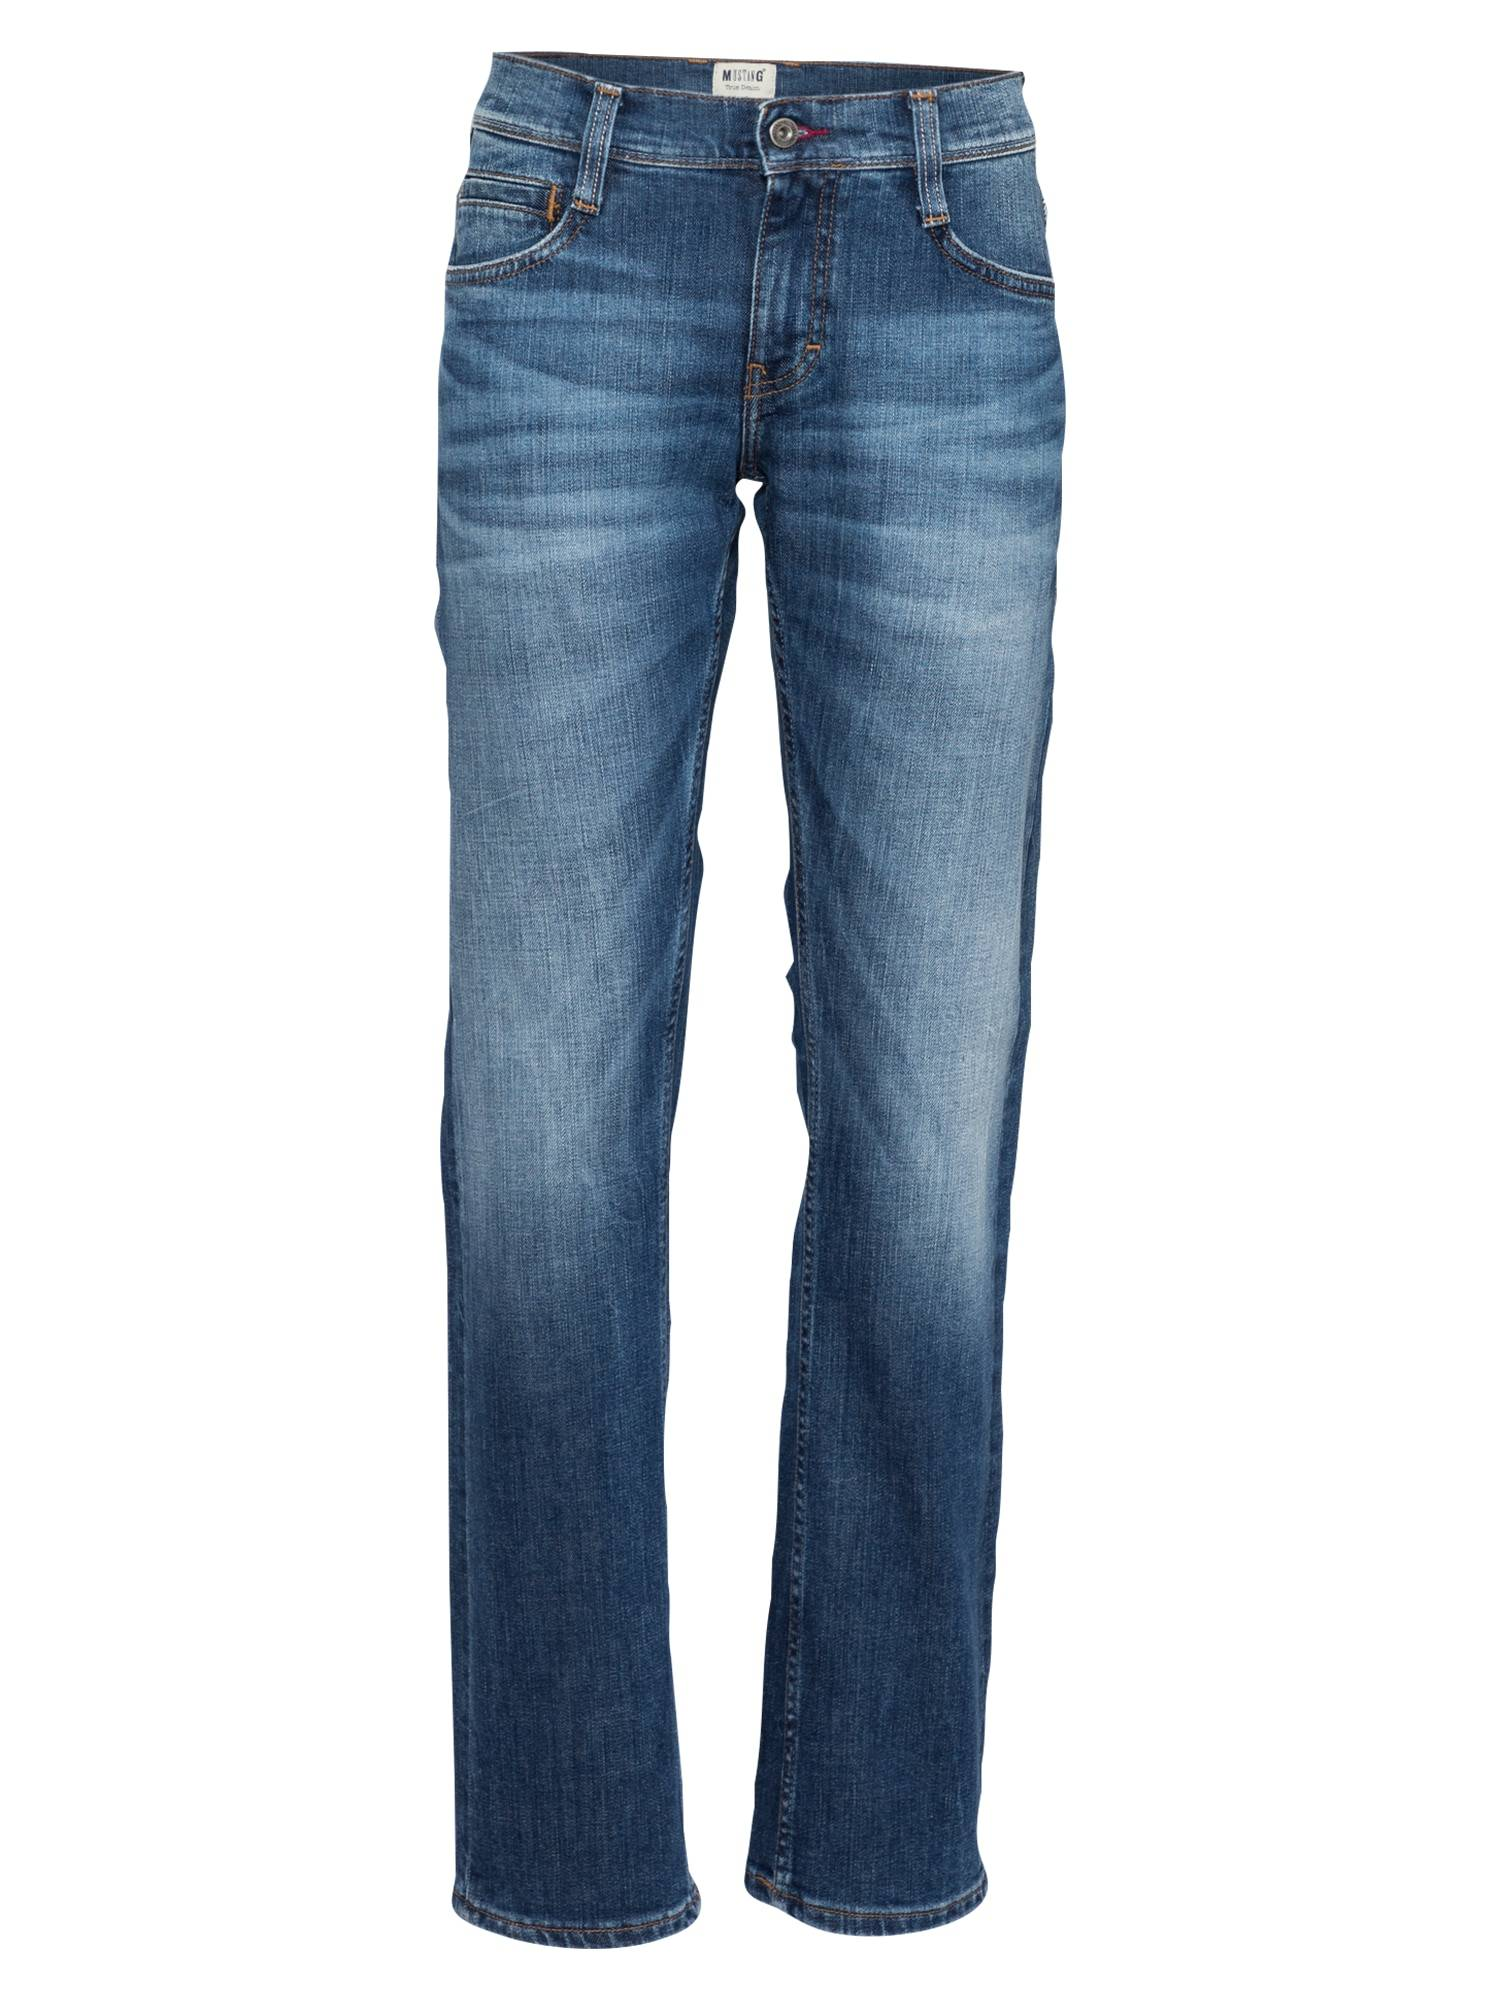 MUSTANG Jean 'Oregon '  - Bleu - Taille: 30/34 - male